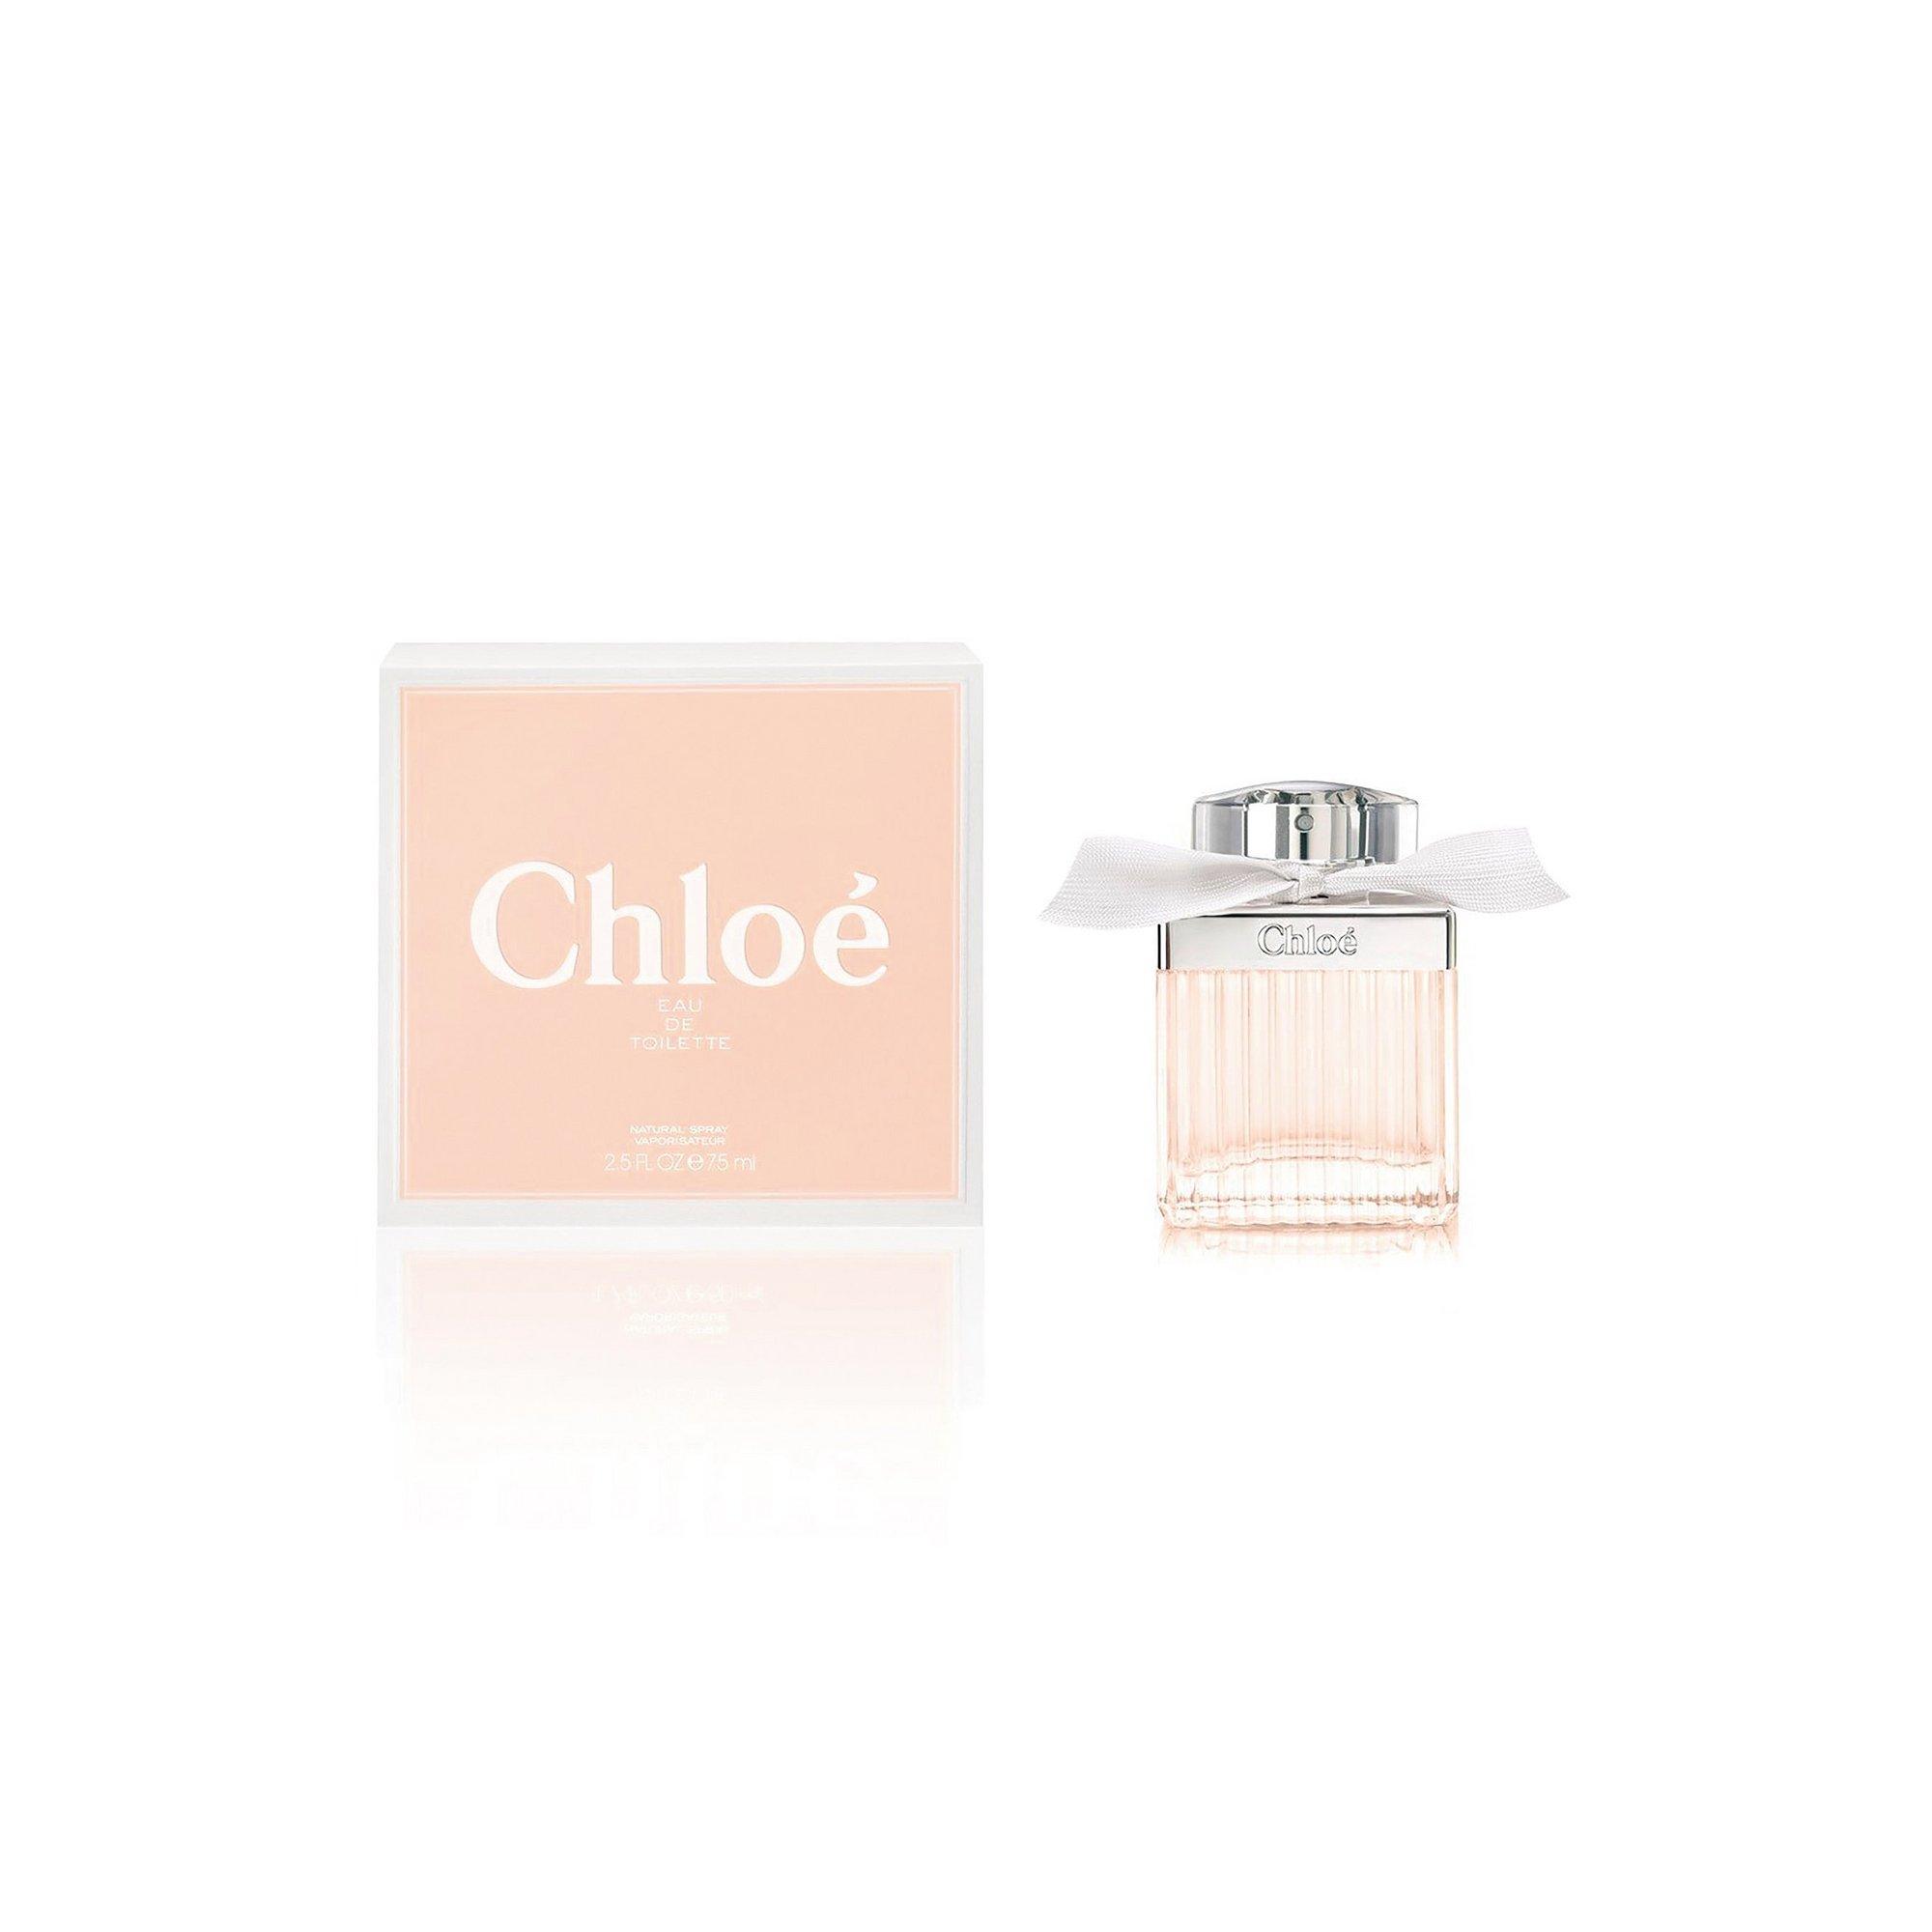 Image of Chloe 30ml EDT